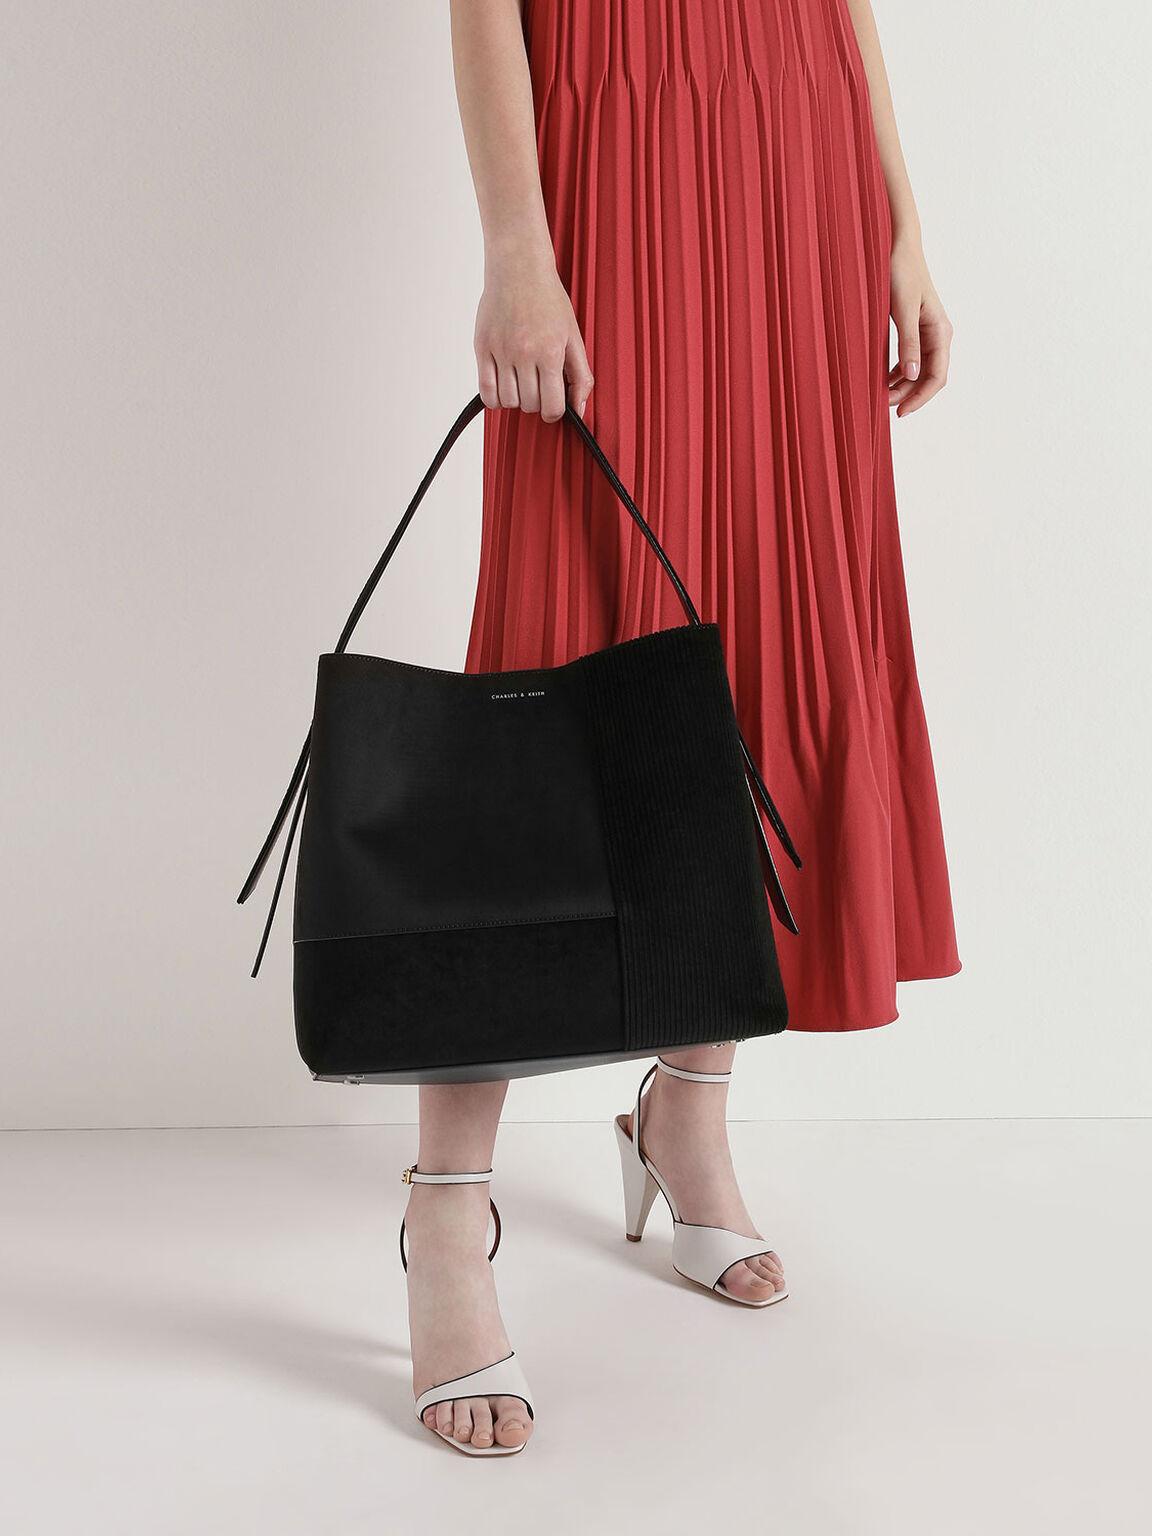 Velvet & Corduroy Square Tote Bag, Black, hi-res